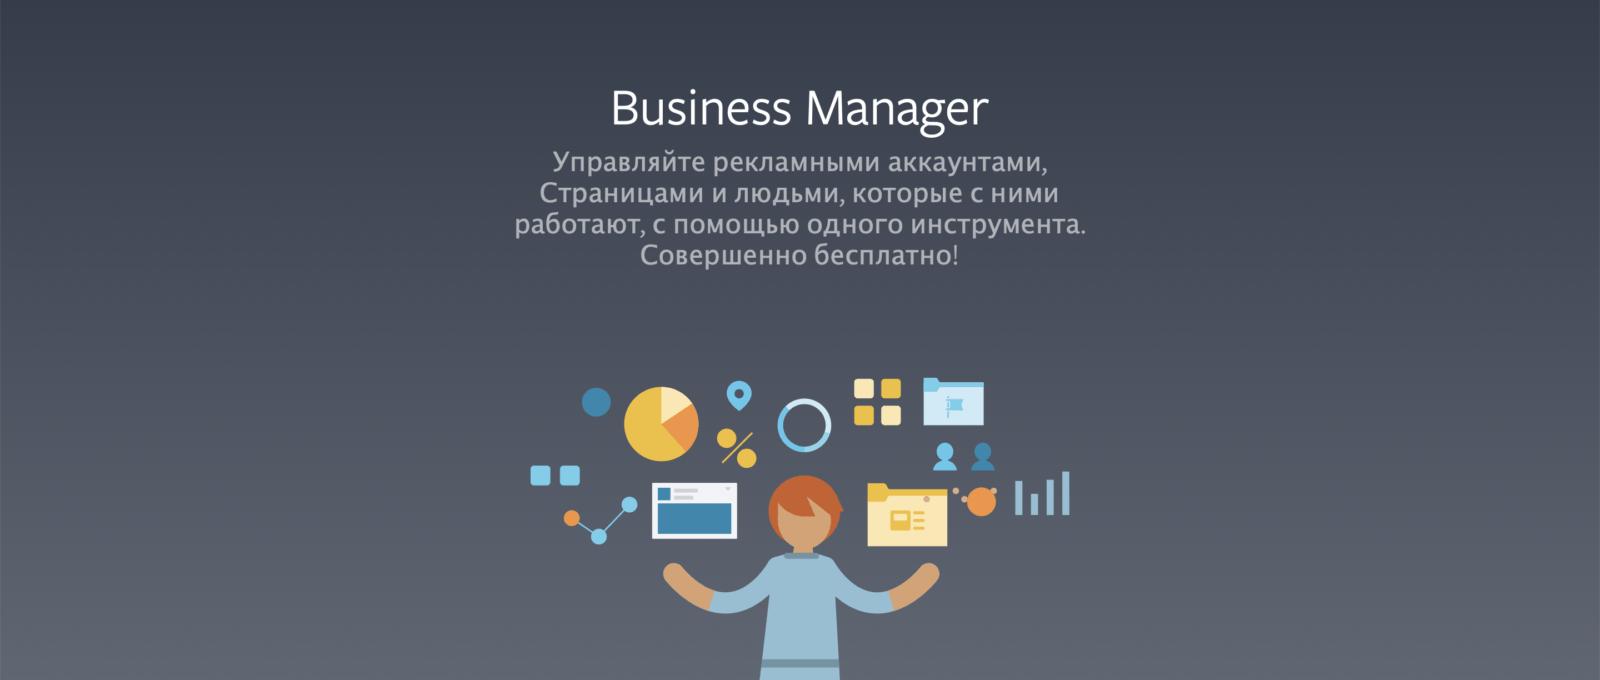 бизнес менеджер (Business manager) фейсбук